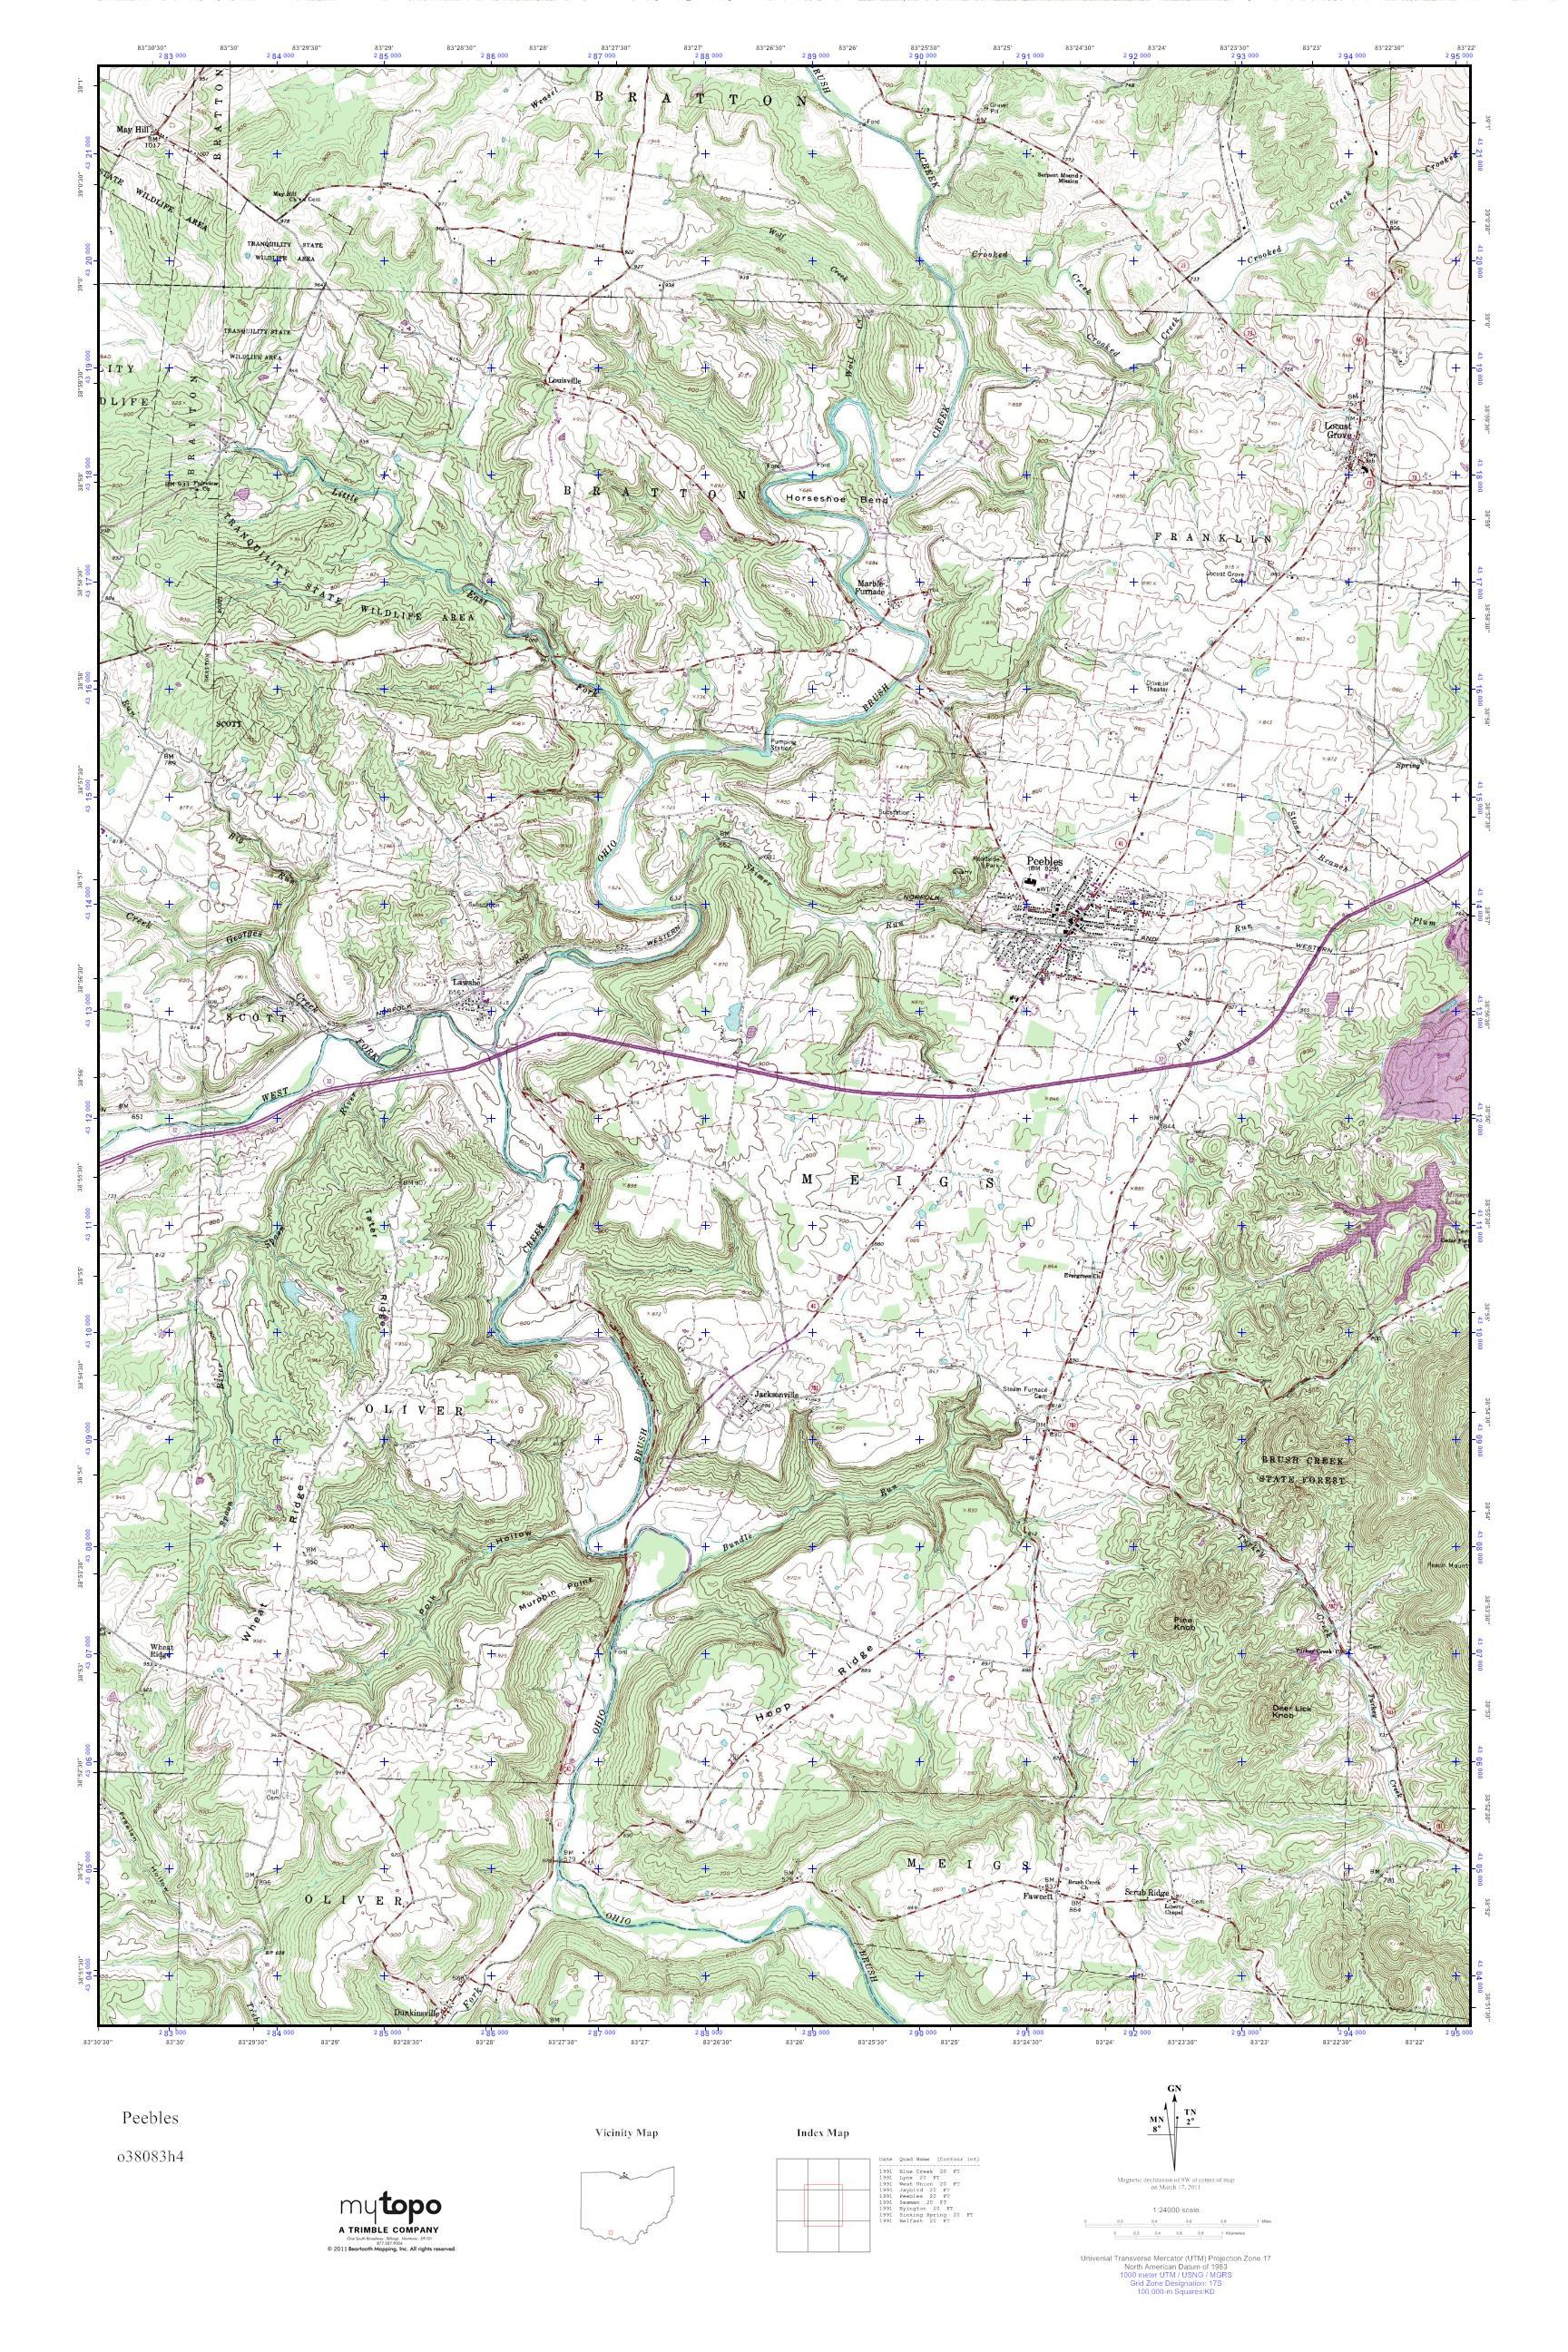 Mytopo Peebles Ohio Usgs Quad Topo Map